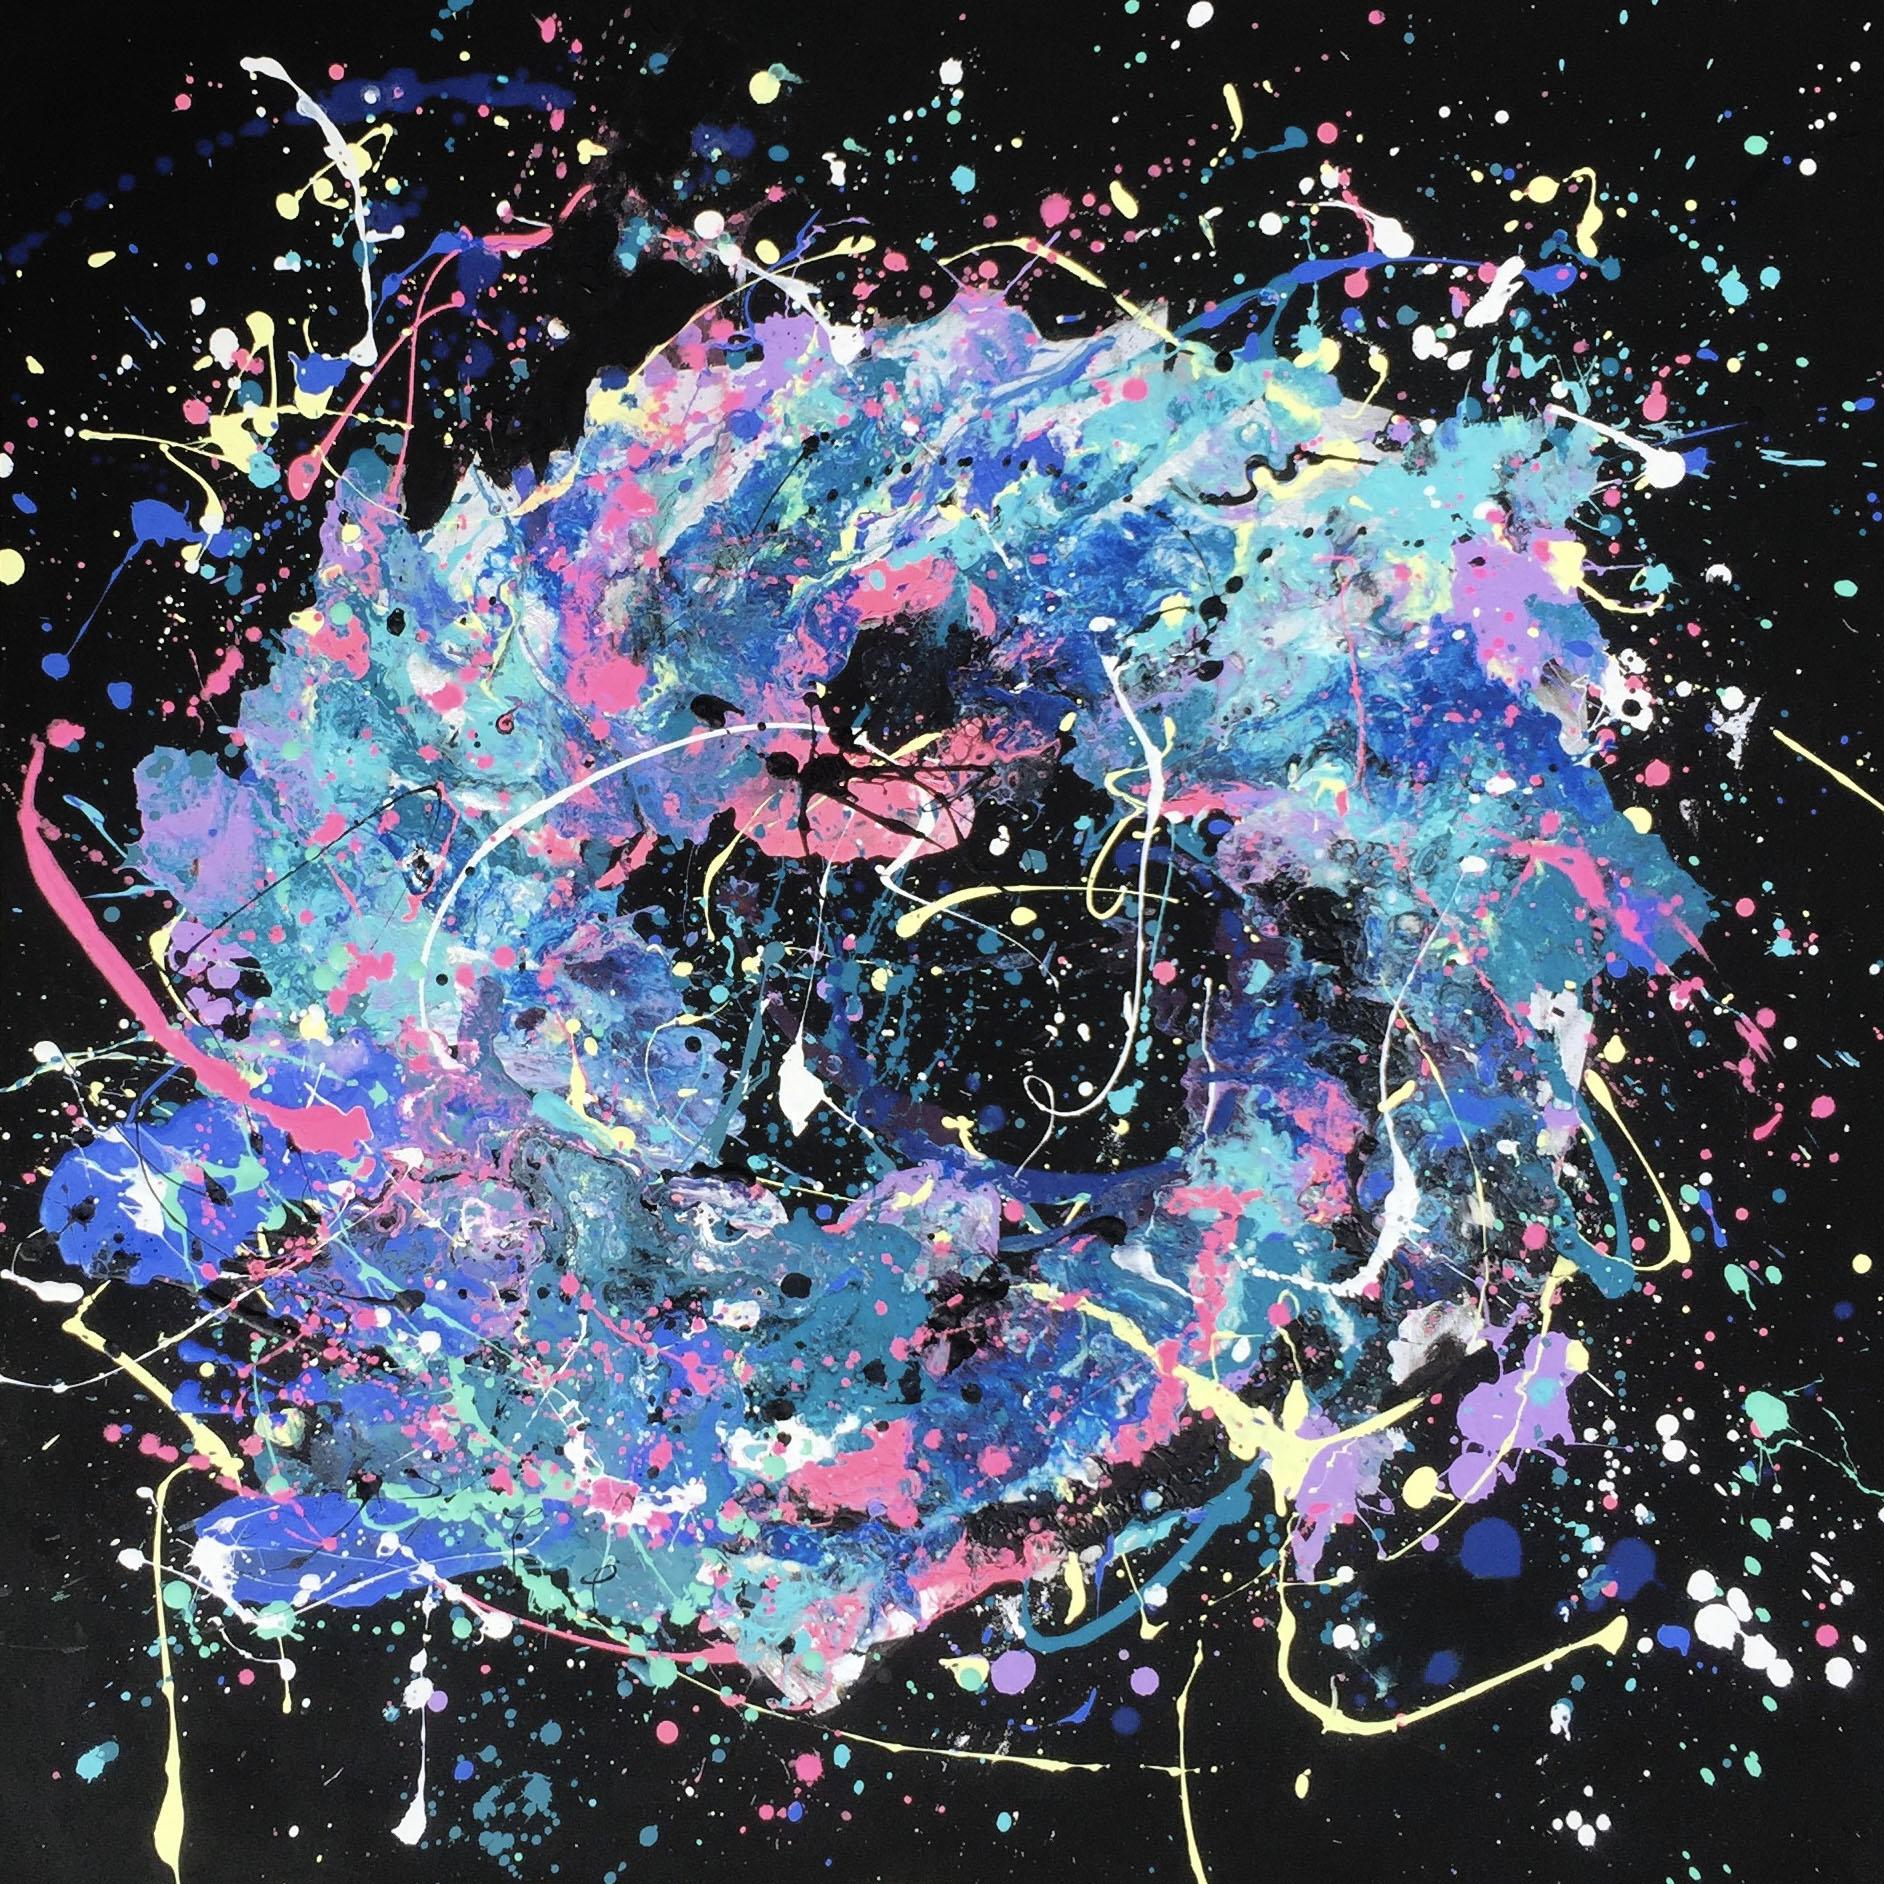 galactic-fairy-ringq1